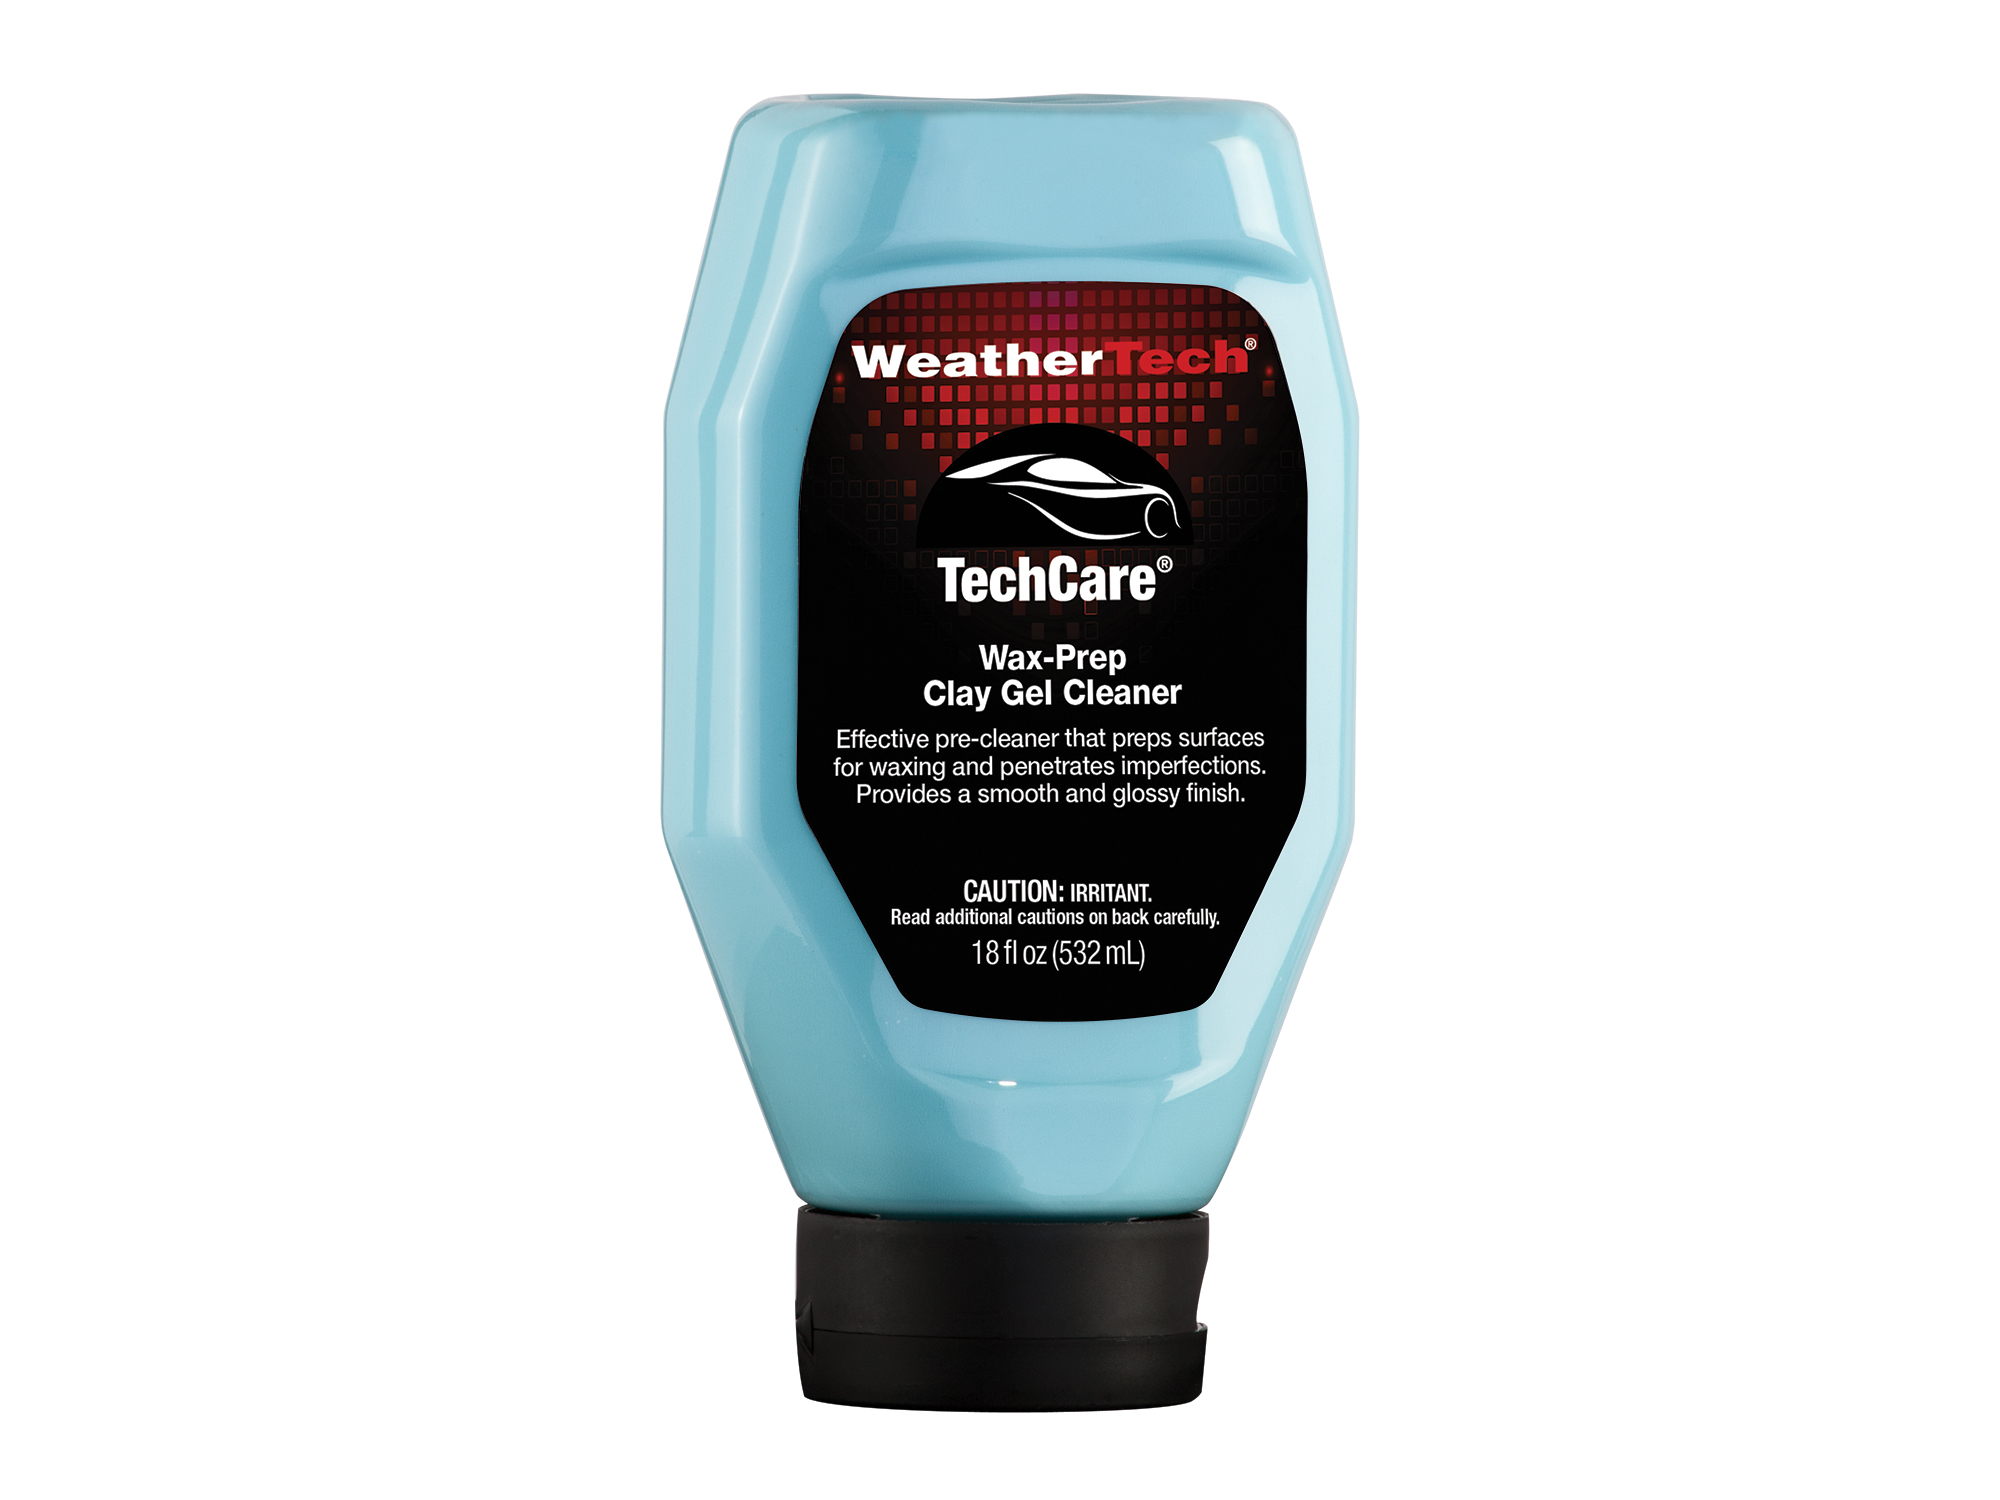 Bottle of TechCare Wax-Prep Clay Gel Cleaner.